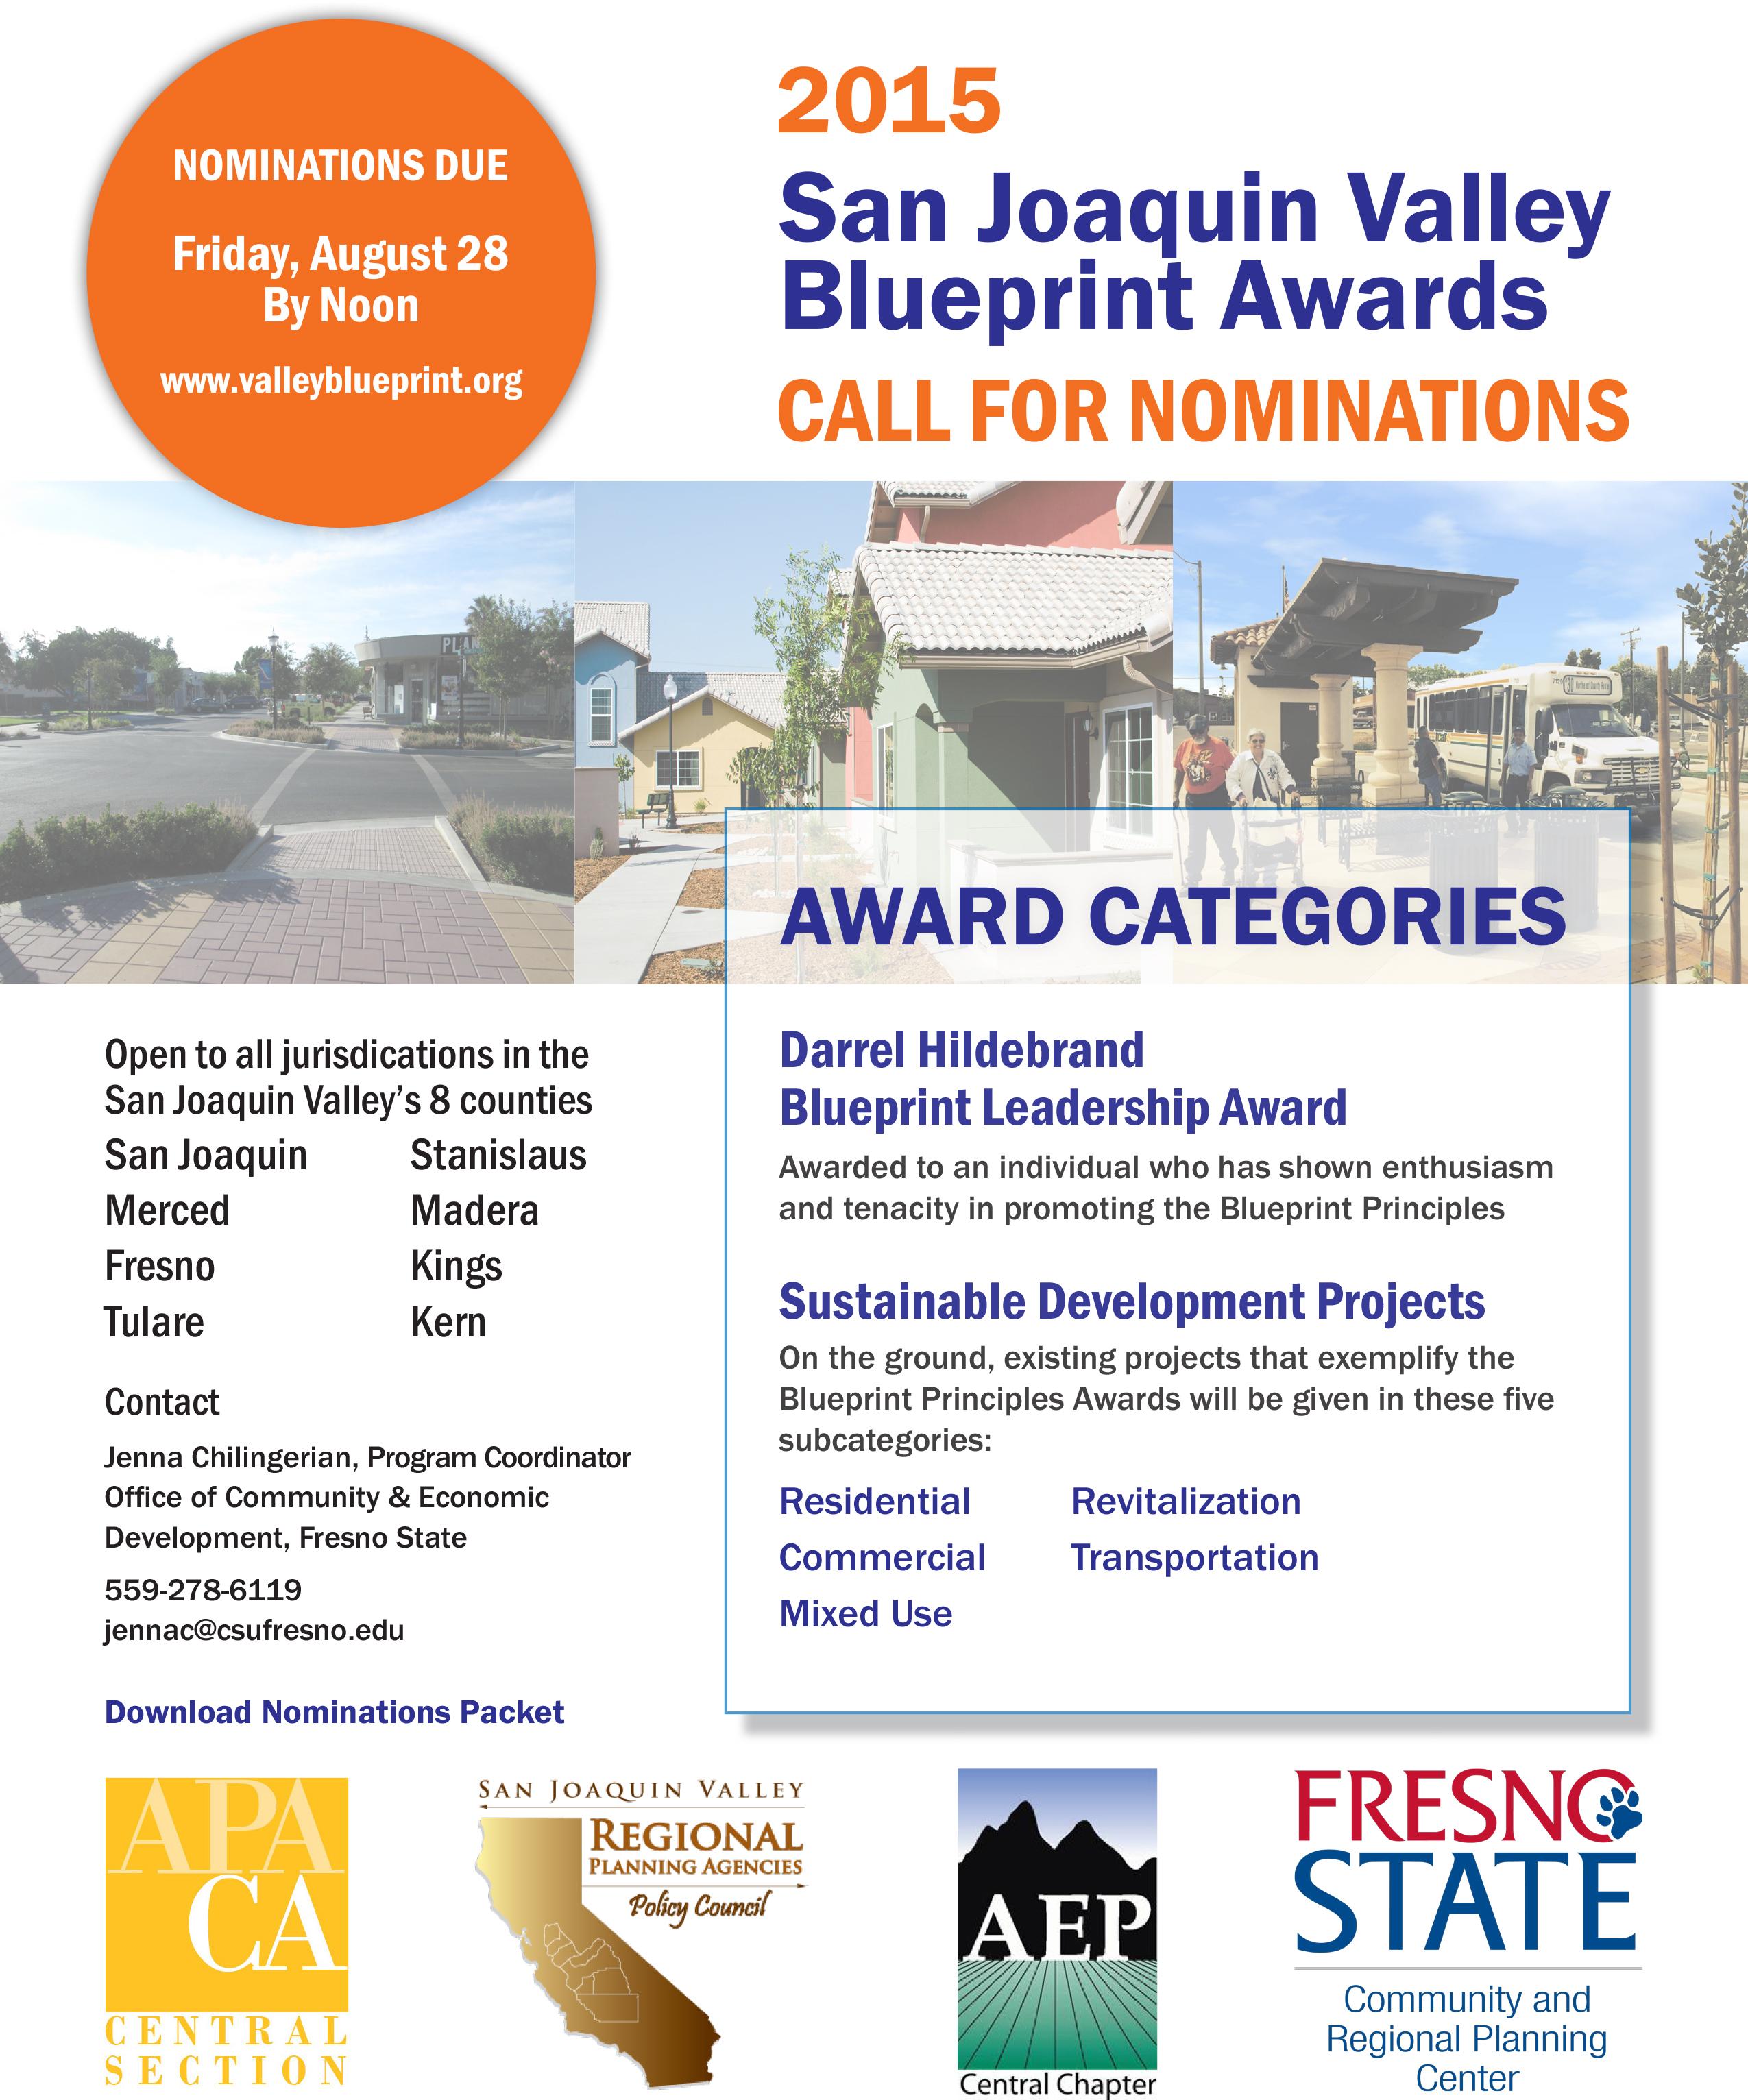 2015 SJV Blueprint Awards nomination period closing soon!